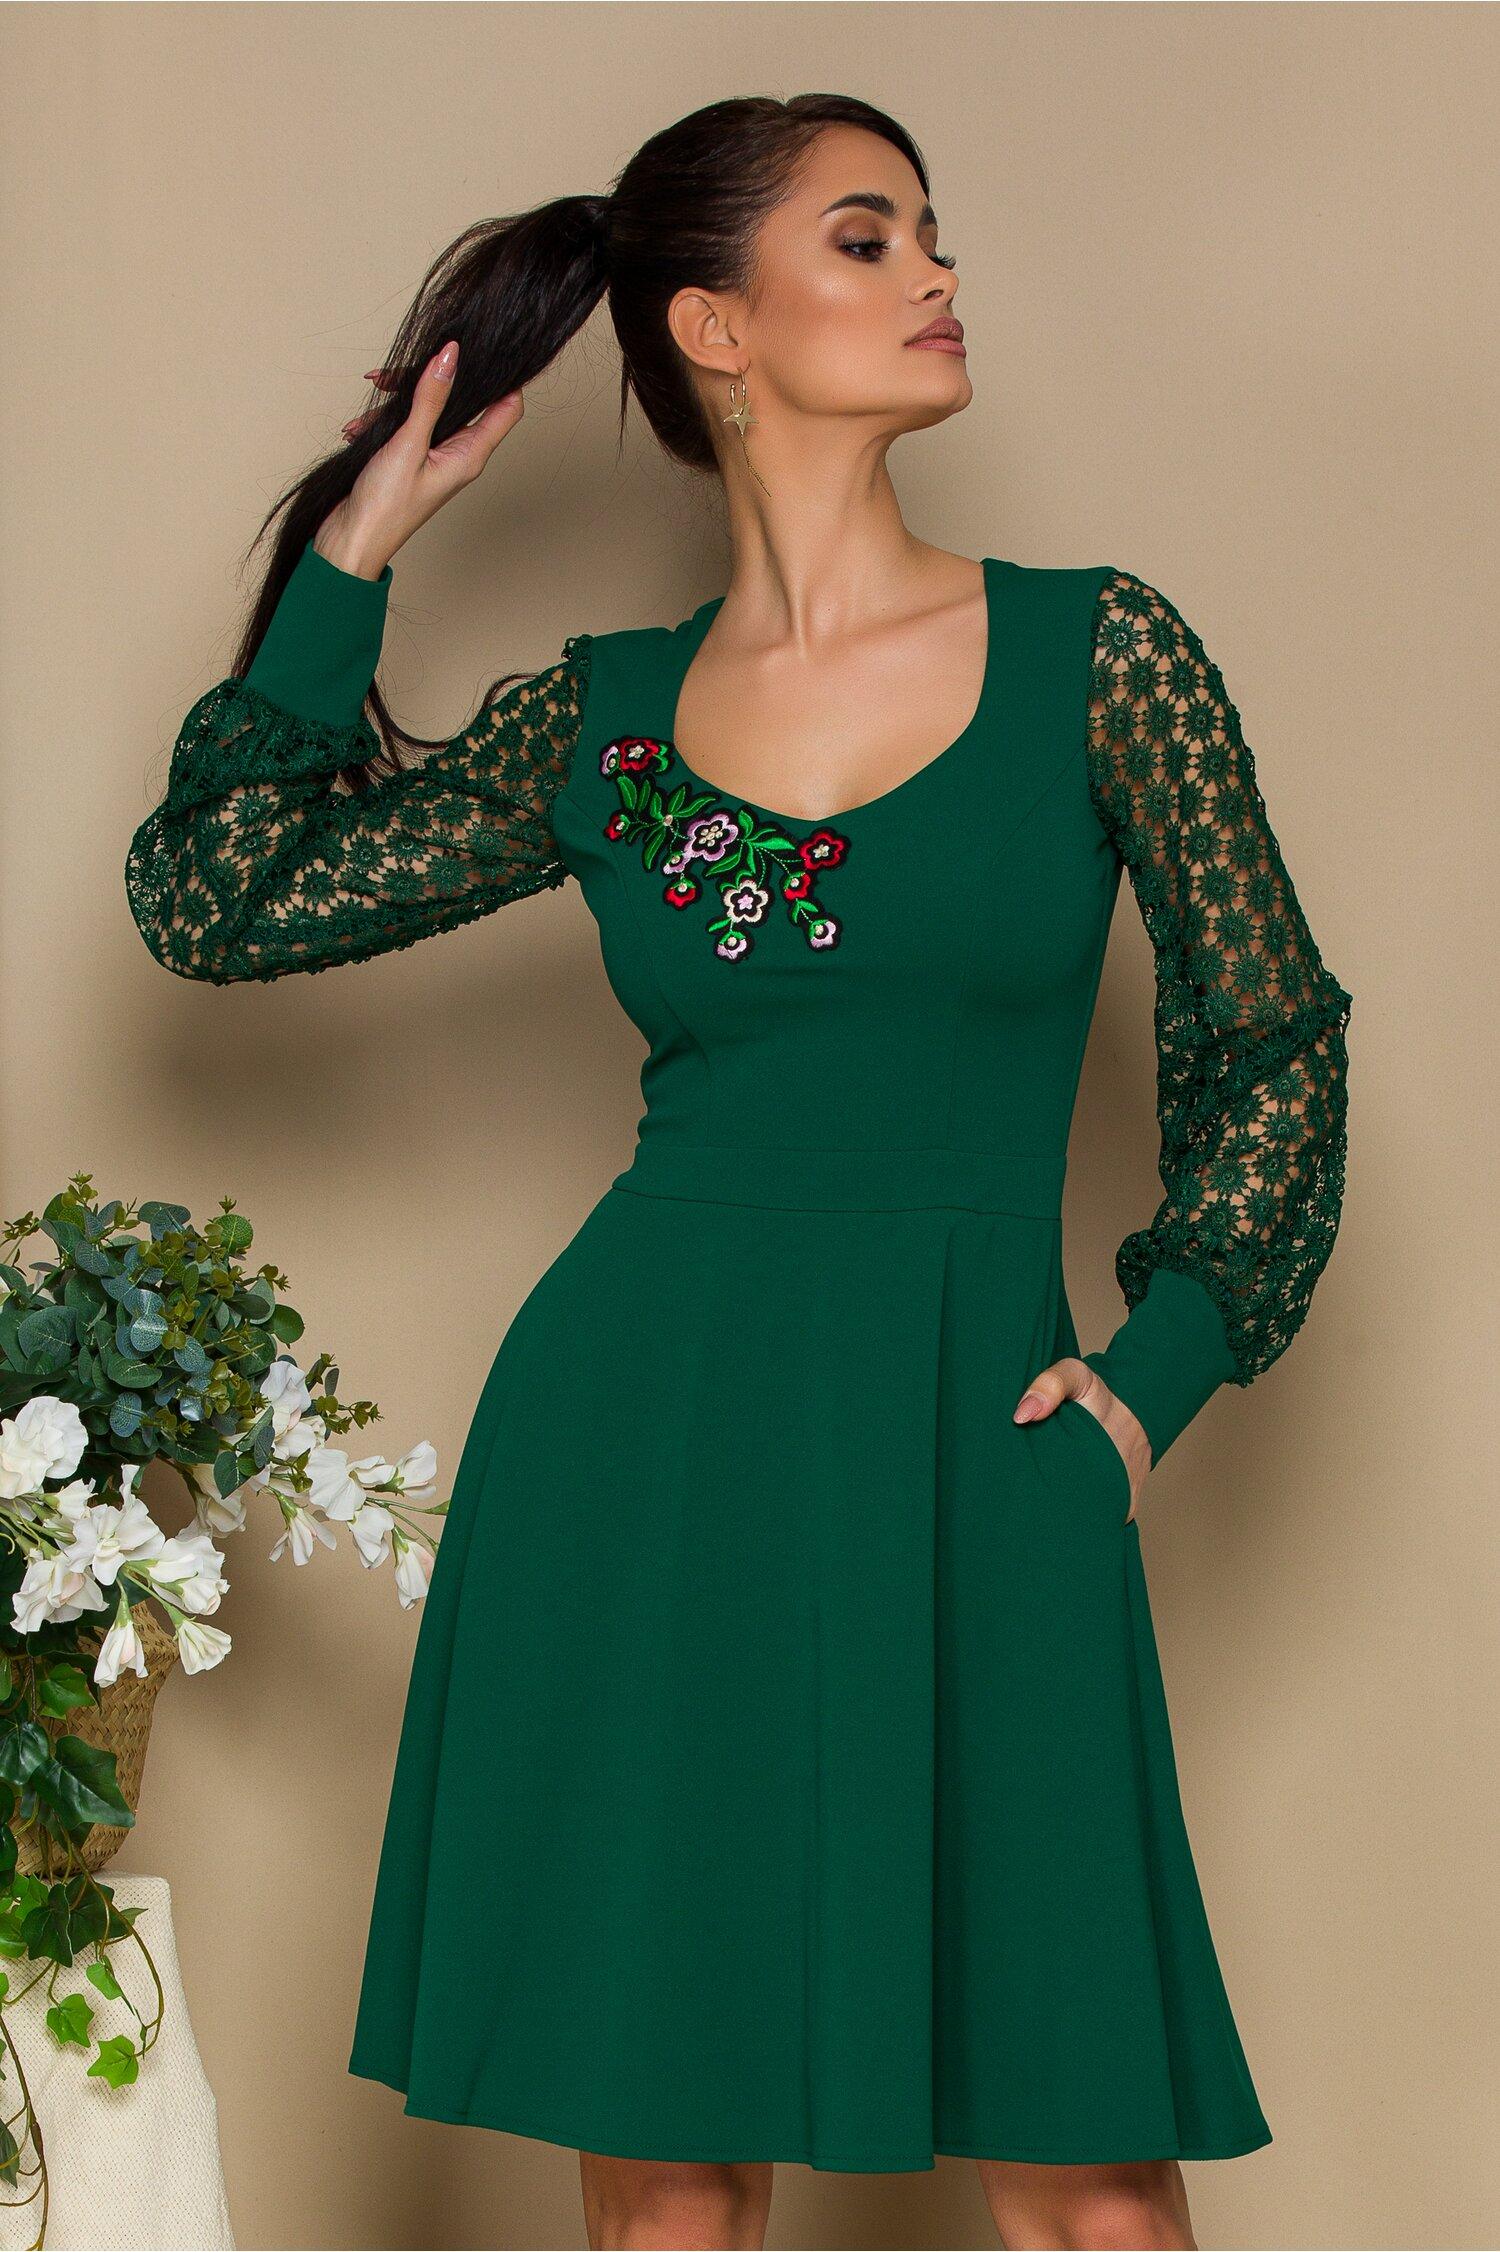 Rochie Ella Collection Carolina verde cu maneci dantela florala imagine dyfashion.ro 2021